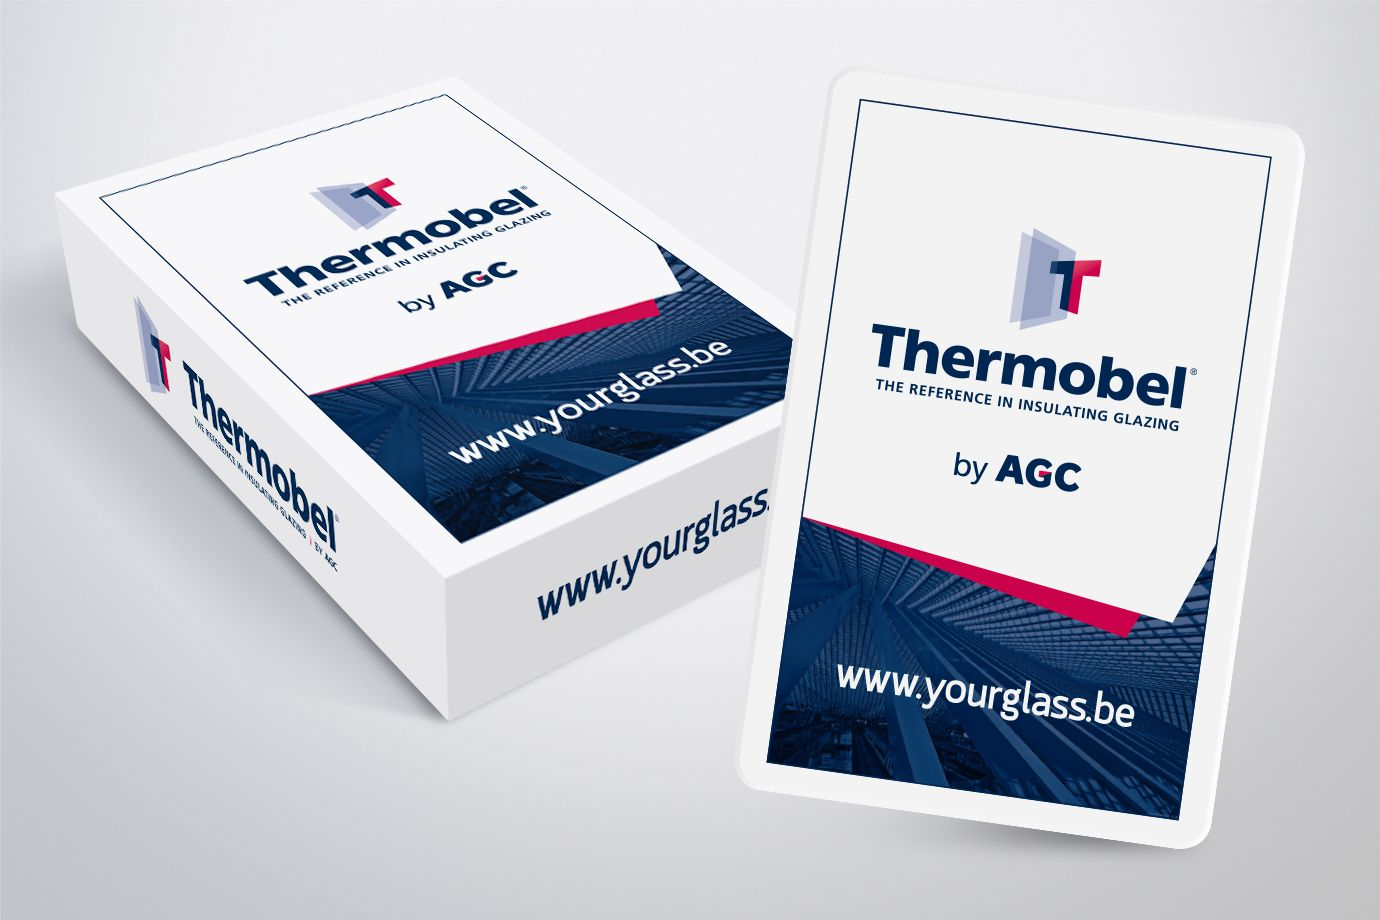 AGC Thermobel Kaartspel